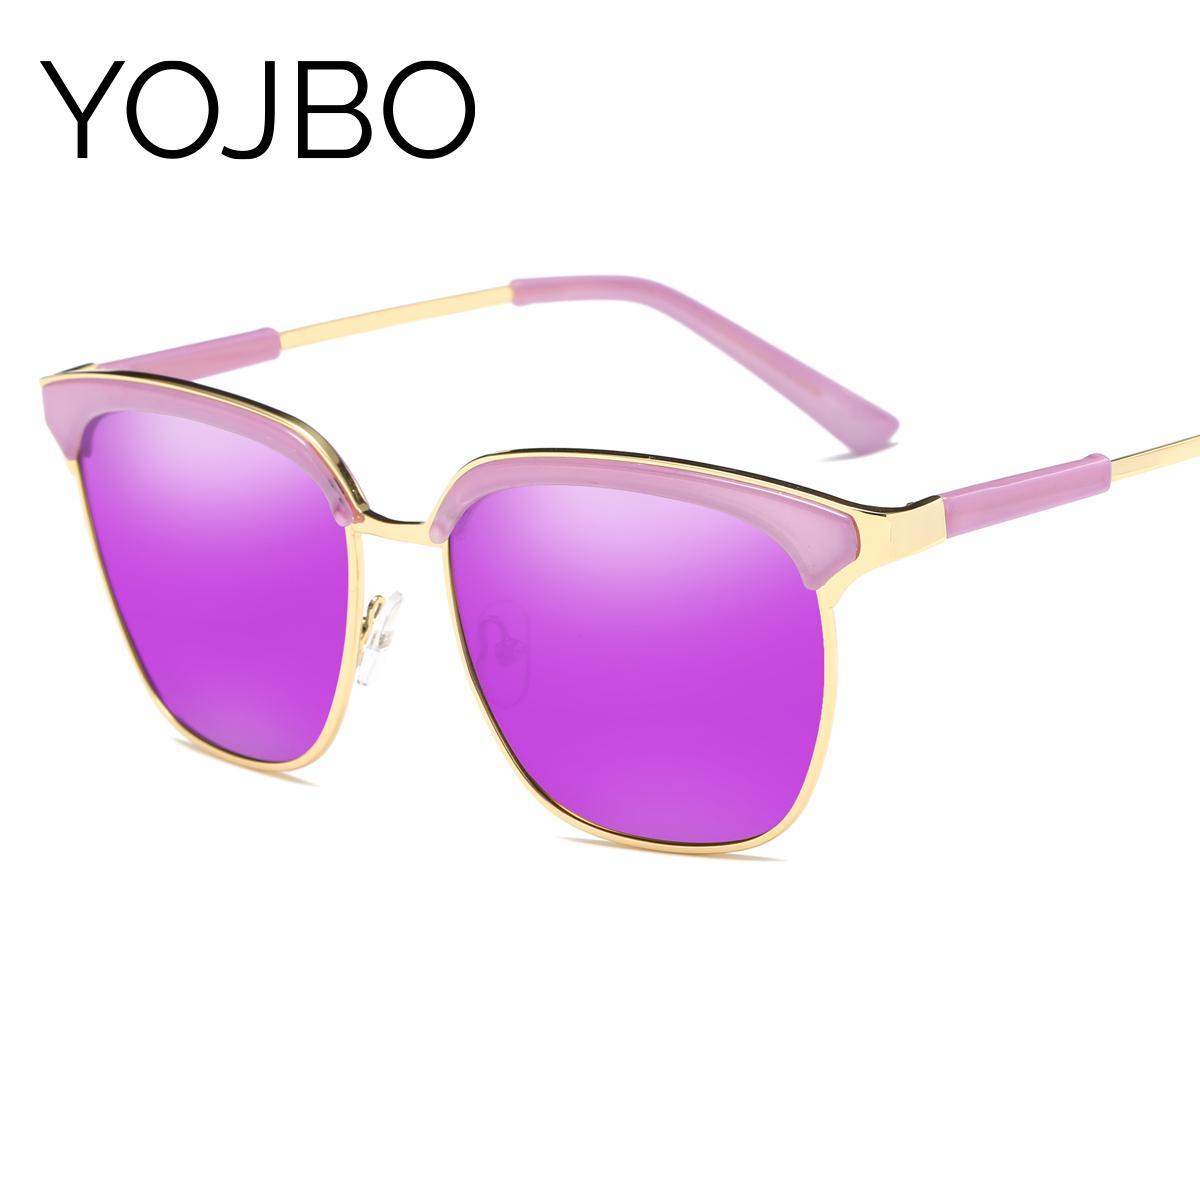 33f31f857a Wholesale Designer Sunglasses Polarized Mirror HD Vintage Glasses ...